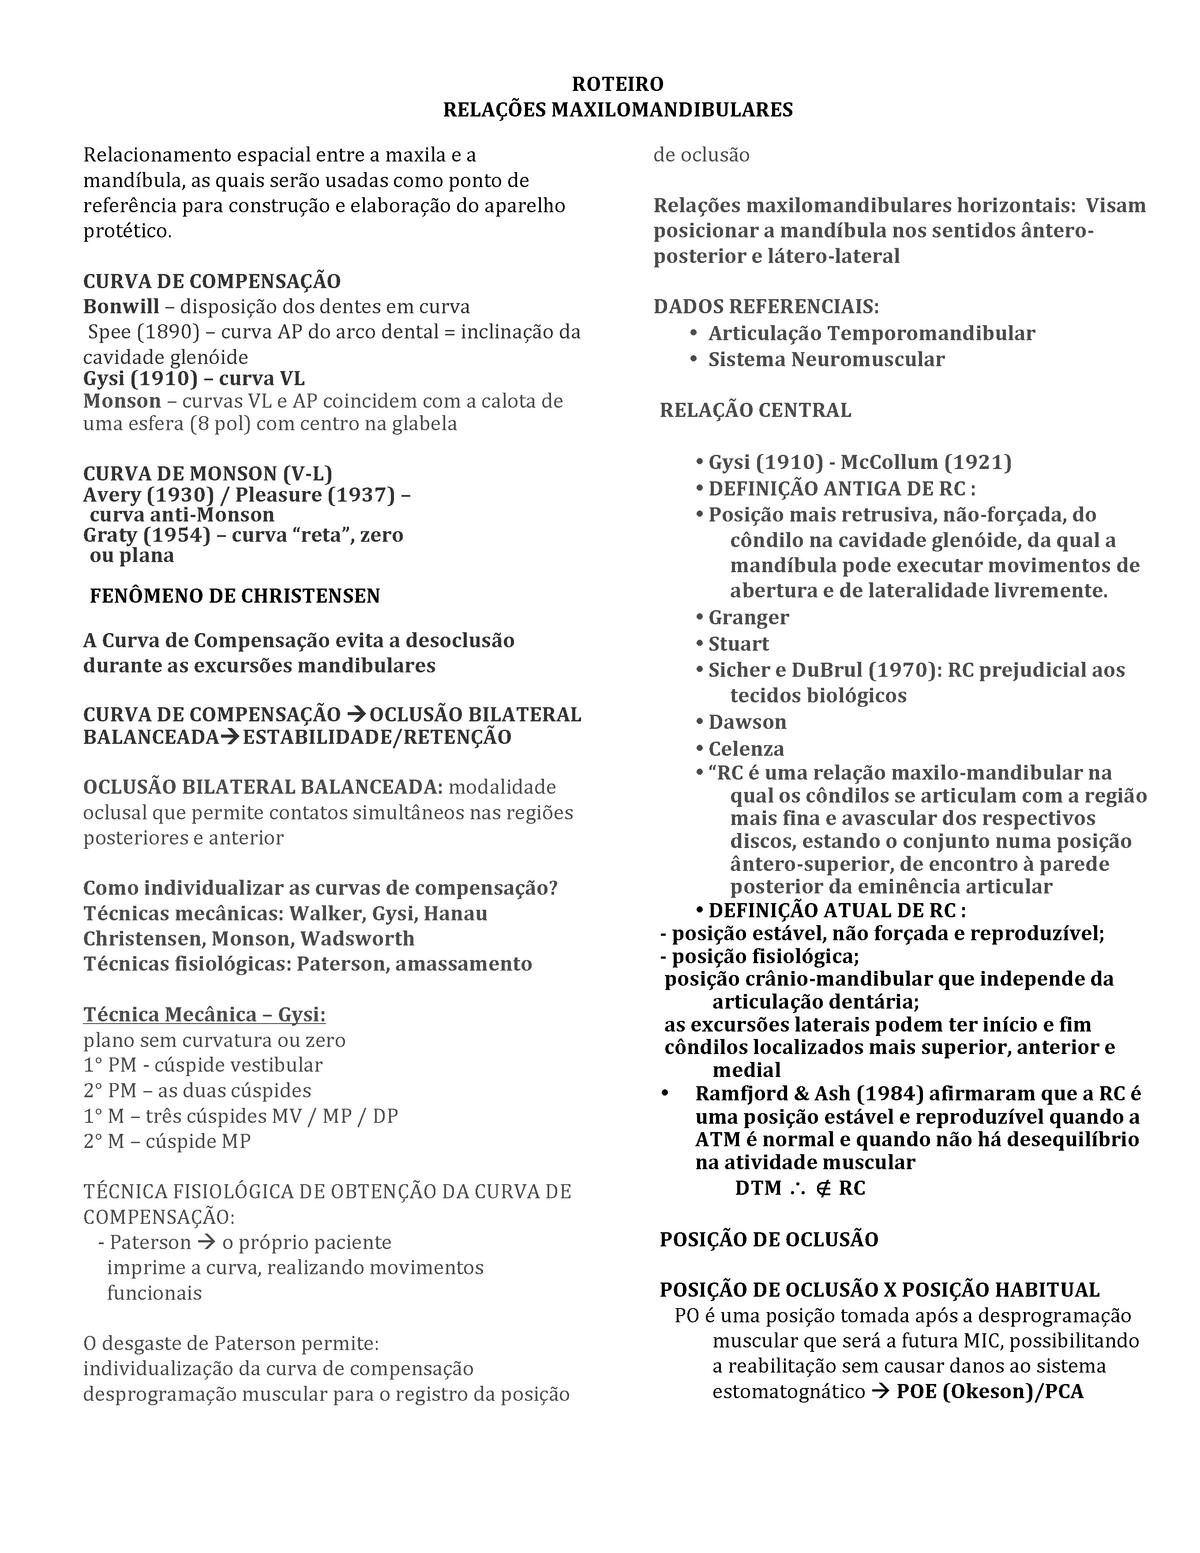 Prótese Tote Up Dentadura Completa Resumos Go Segunda   Curva De ...